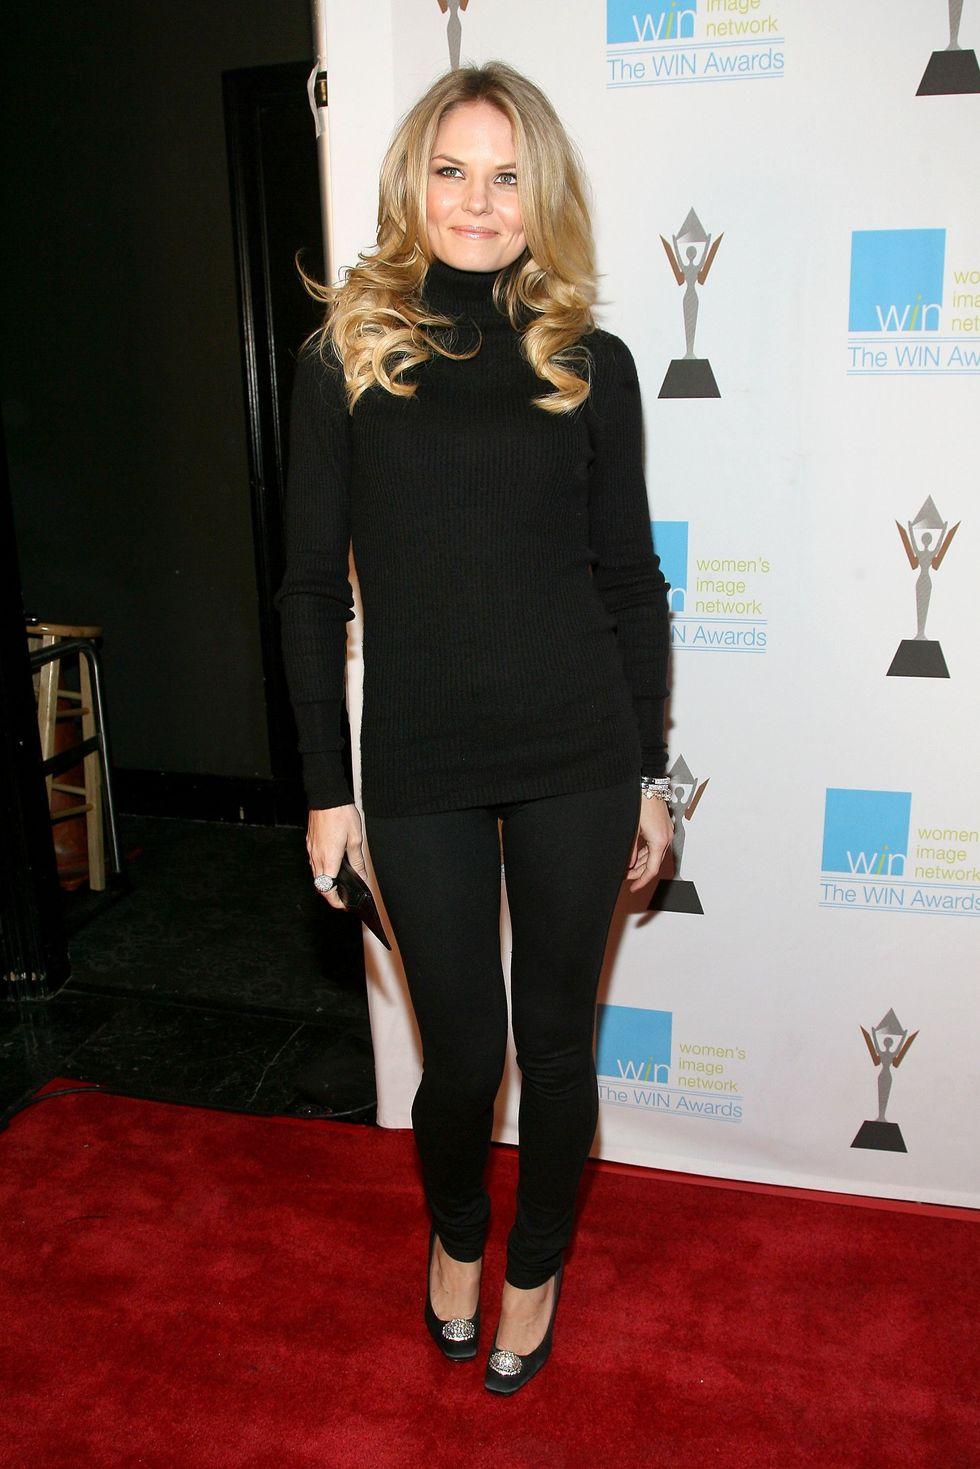 jennifer-morrison-womens-image-network-2009-win-awards-06